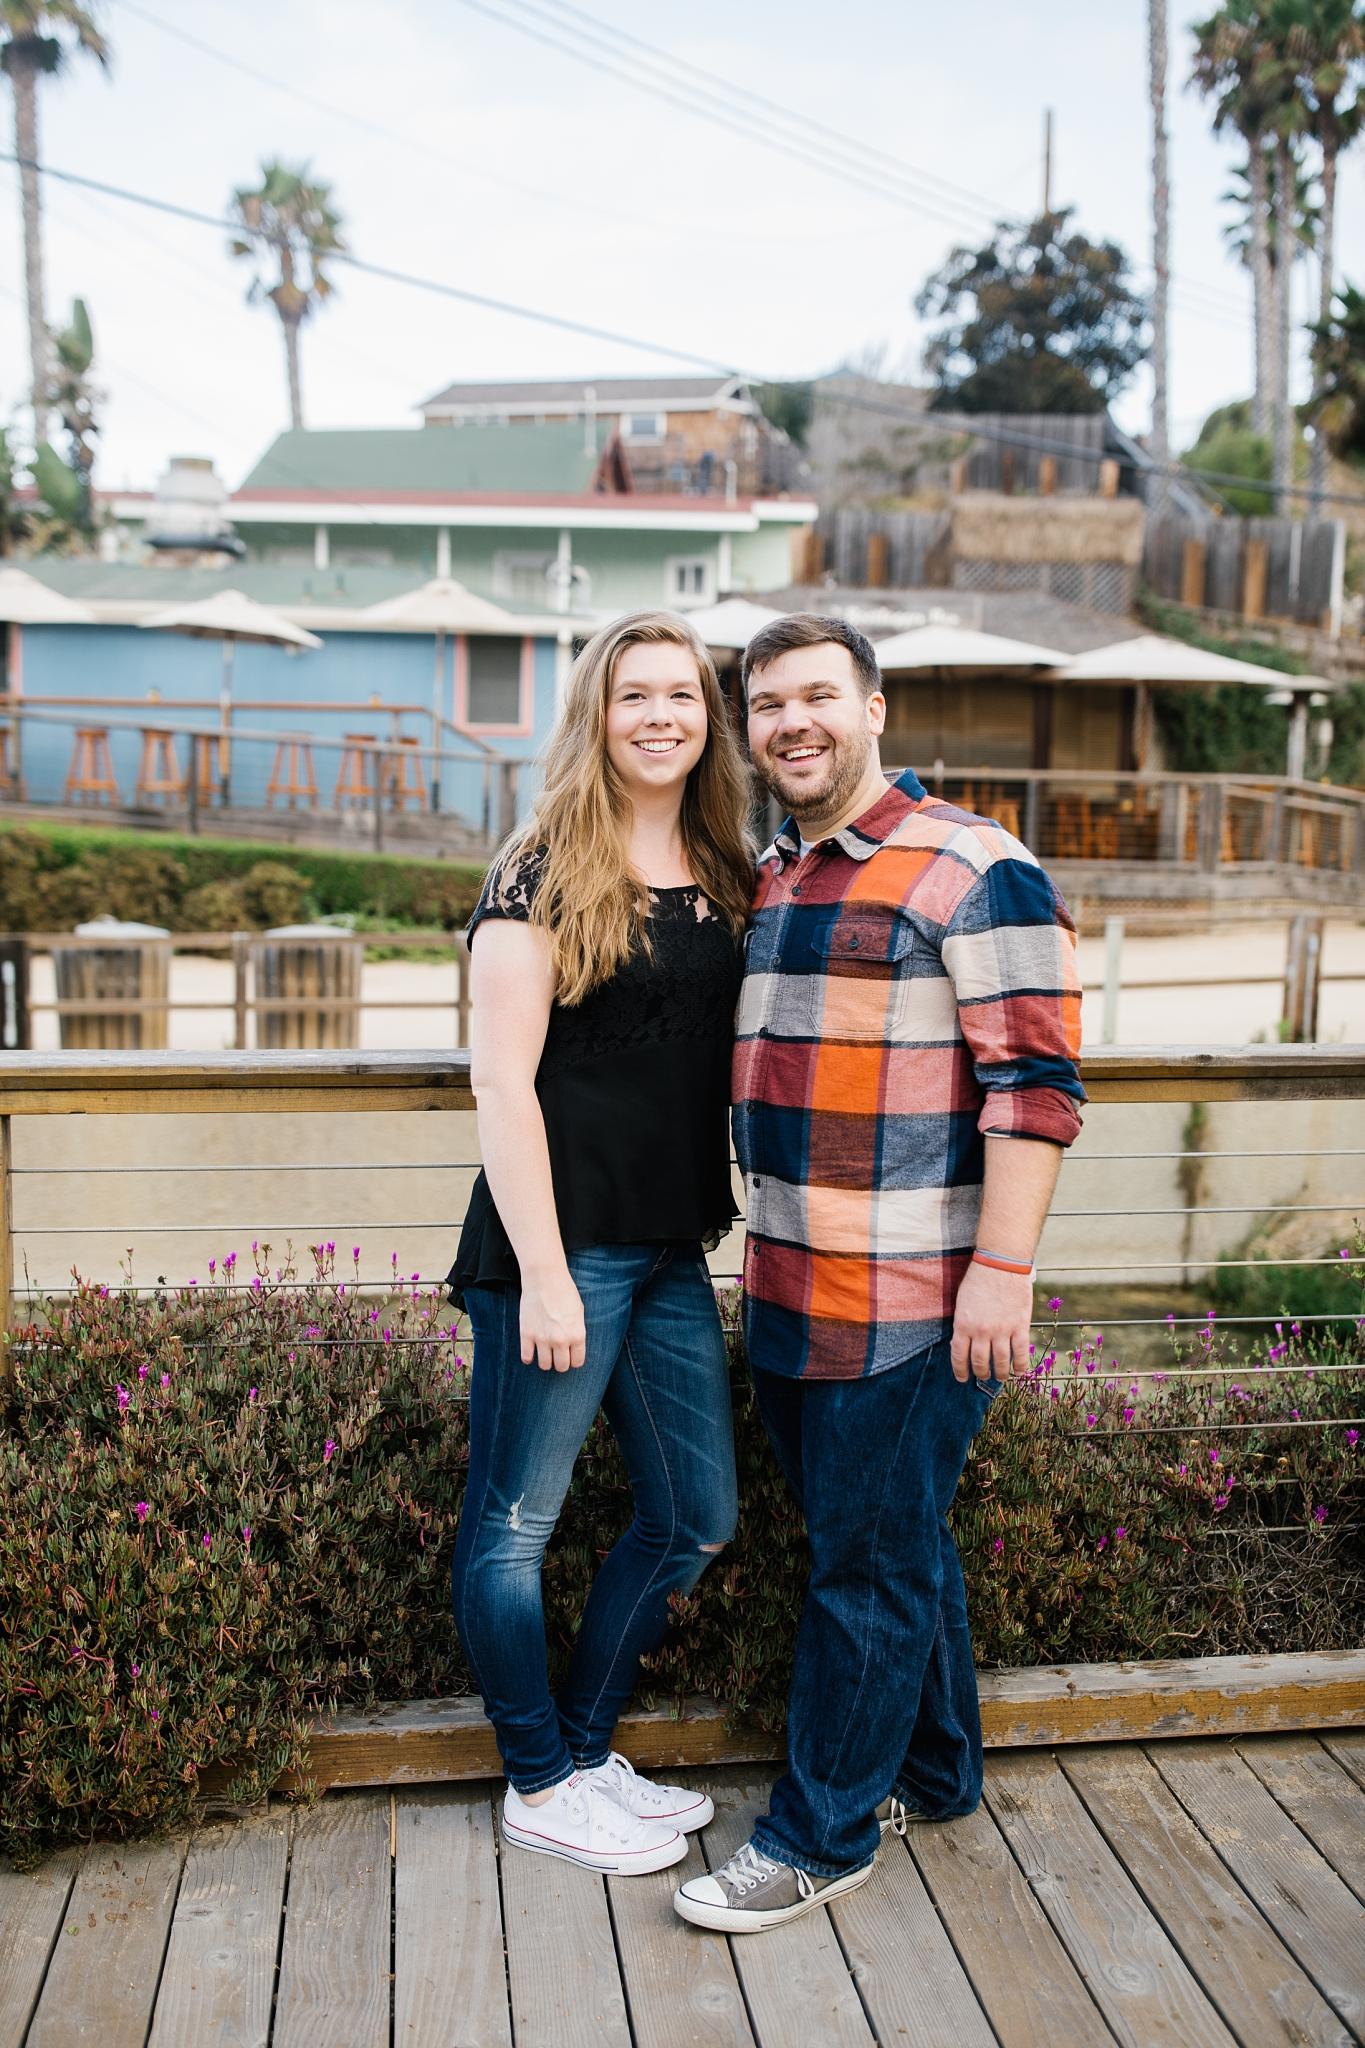 CassandraNathan-71E_Lizzie-B-Imagery-California-Wedding-Photographer-Crystal-Cove-Photography-Engagement-Session-Orange-County-Wedding-Photographer.jpg